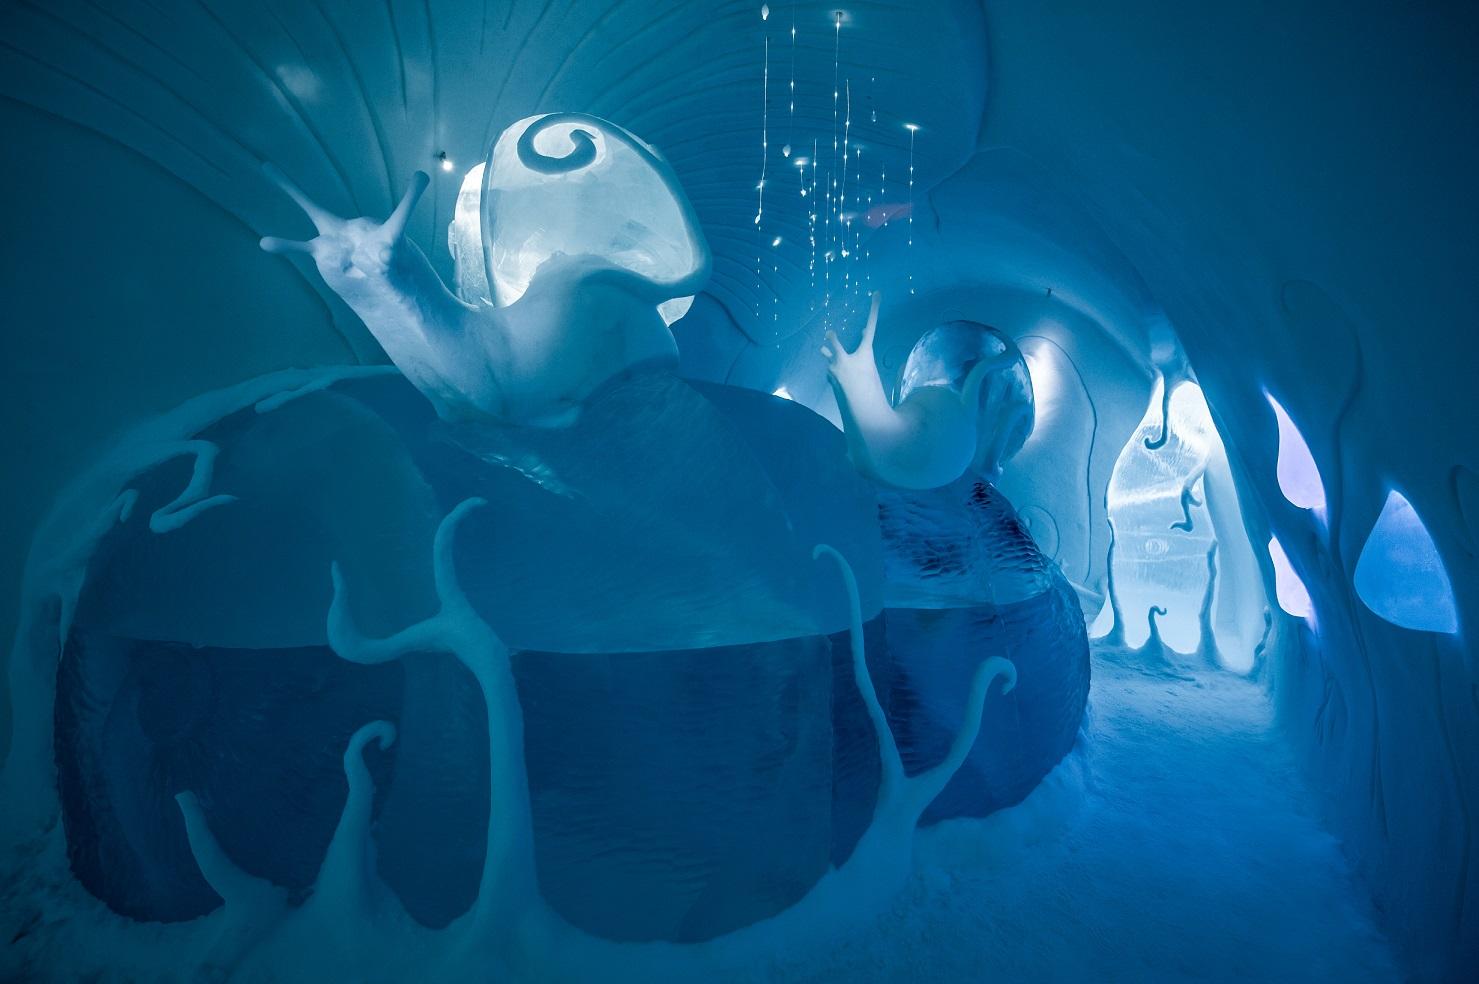 medium art suite ground rules icehotel 28 Design Carl Wellander Ulrika Tallving. Photo Asaf Kliger. 2